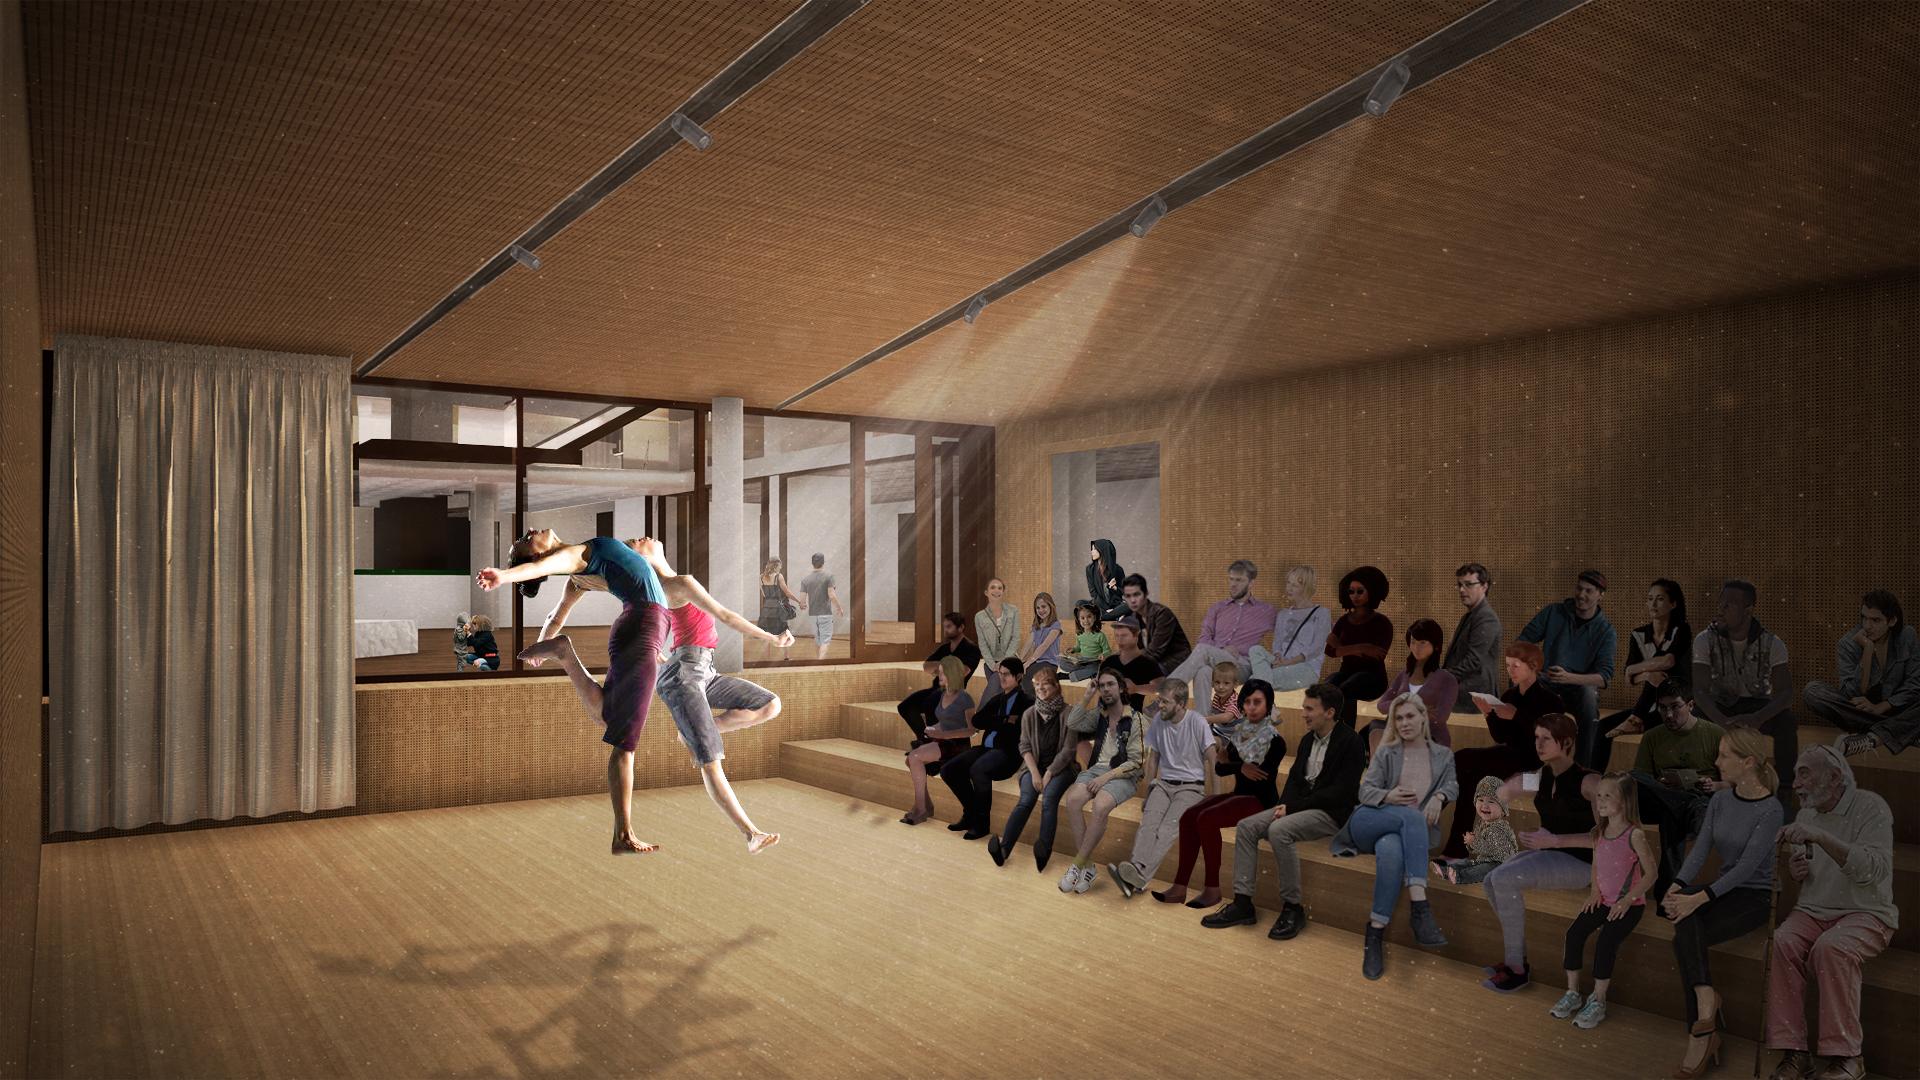 <p>Interieur auditorium. Theater aan de Parade door NOAHH | Network Oriented Architecture</p>